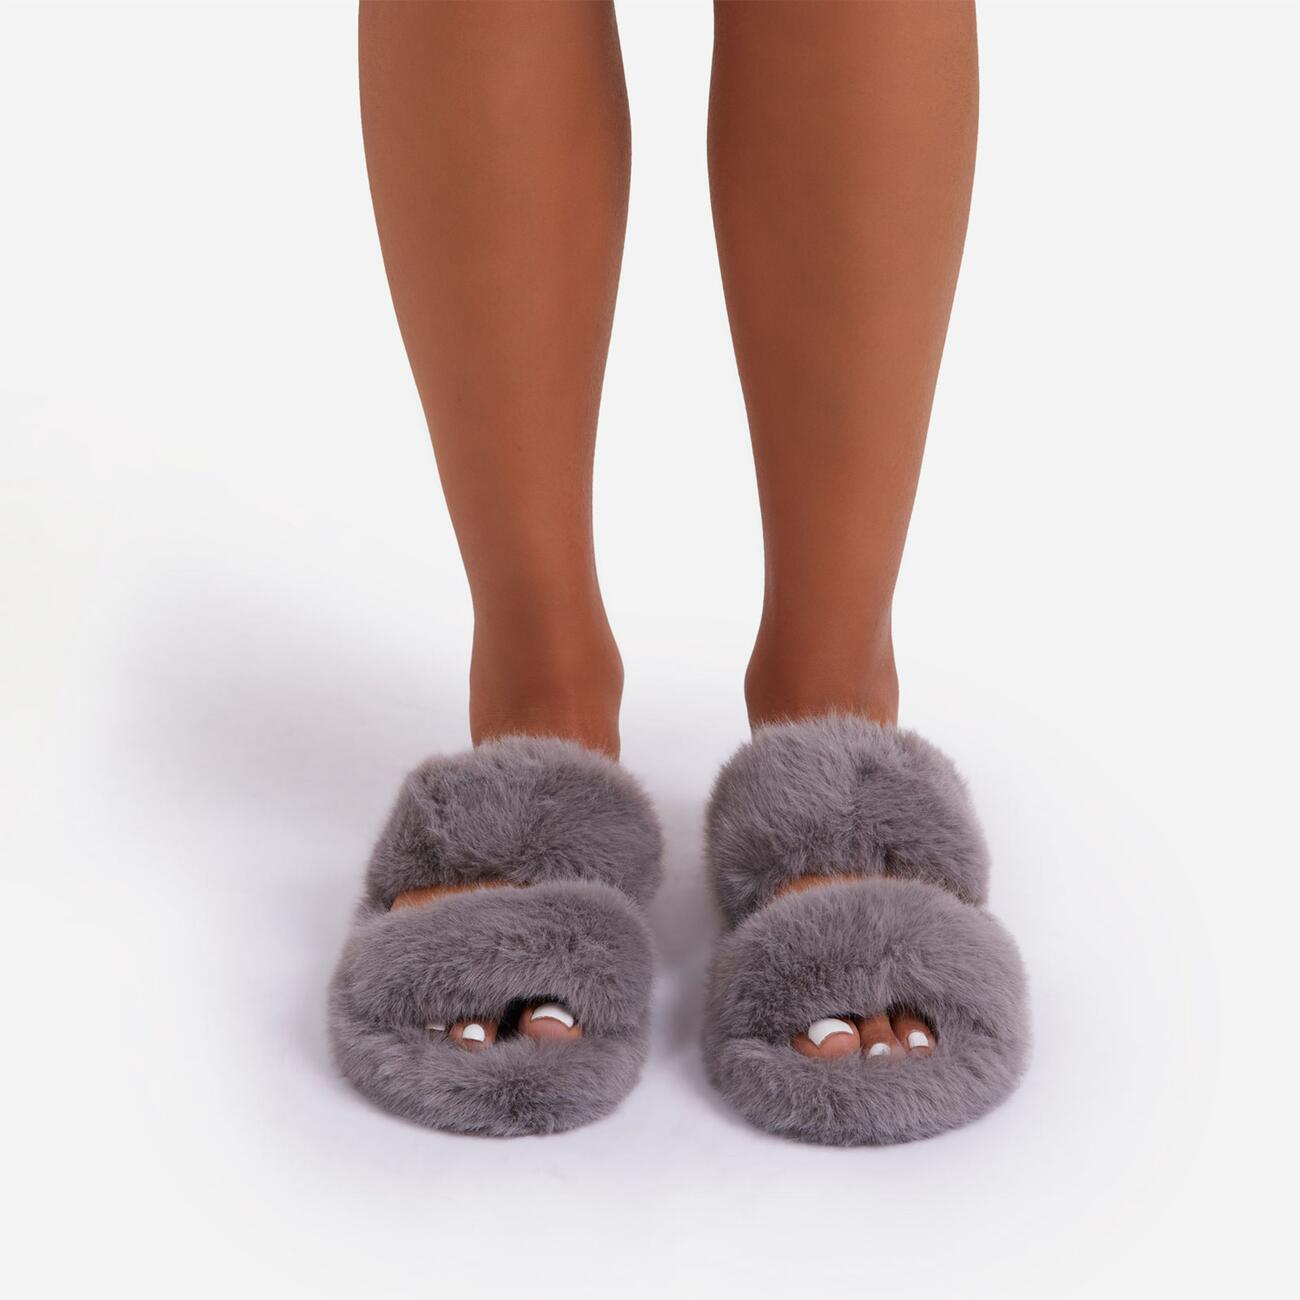 Pamper Fluffy Double Strap Slider Slipper In Grey Faux Fur Image 4